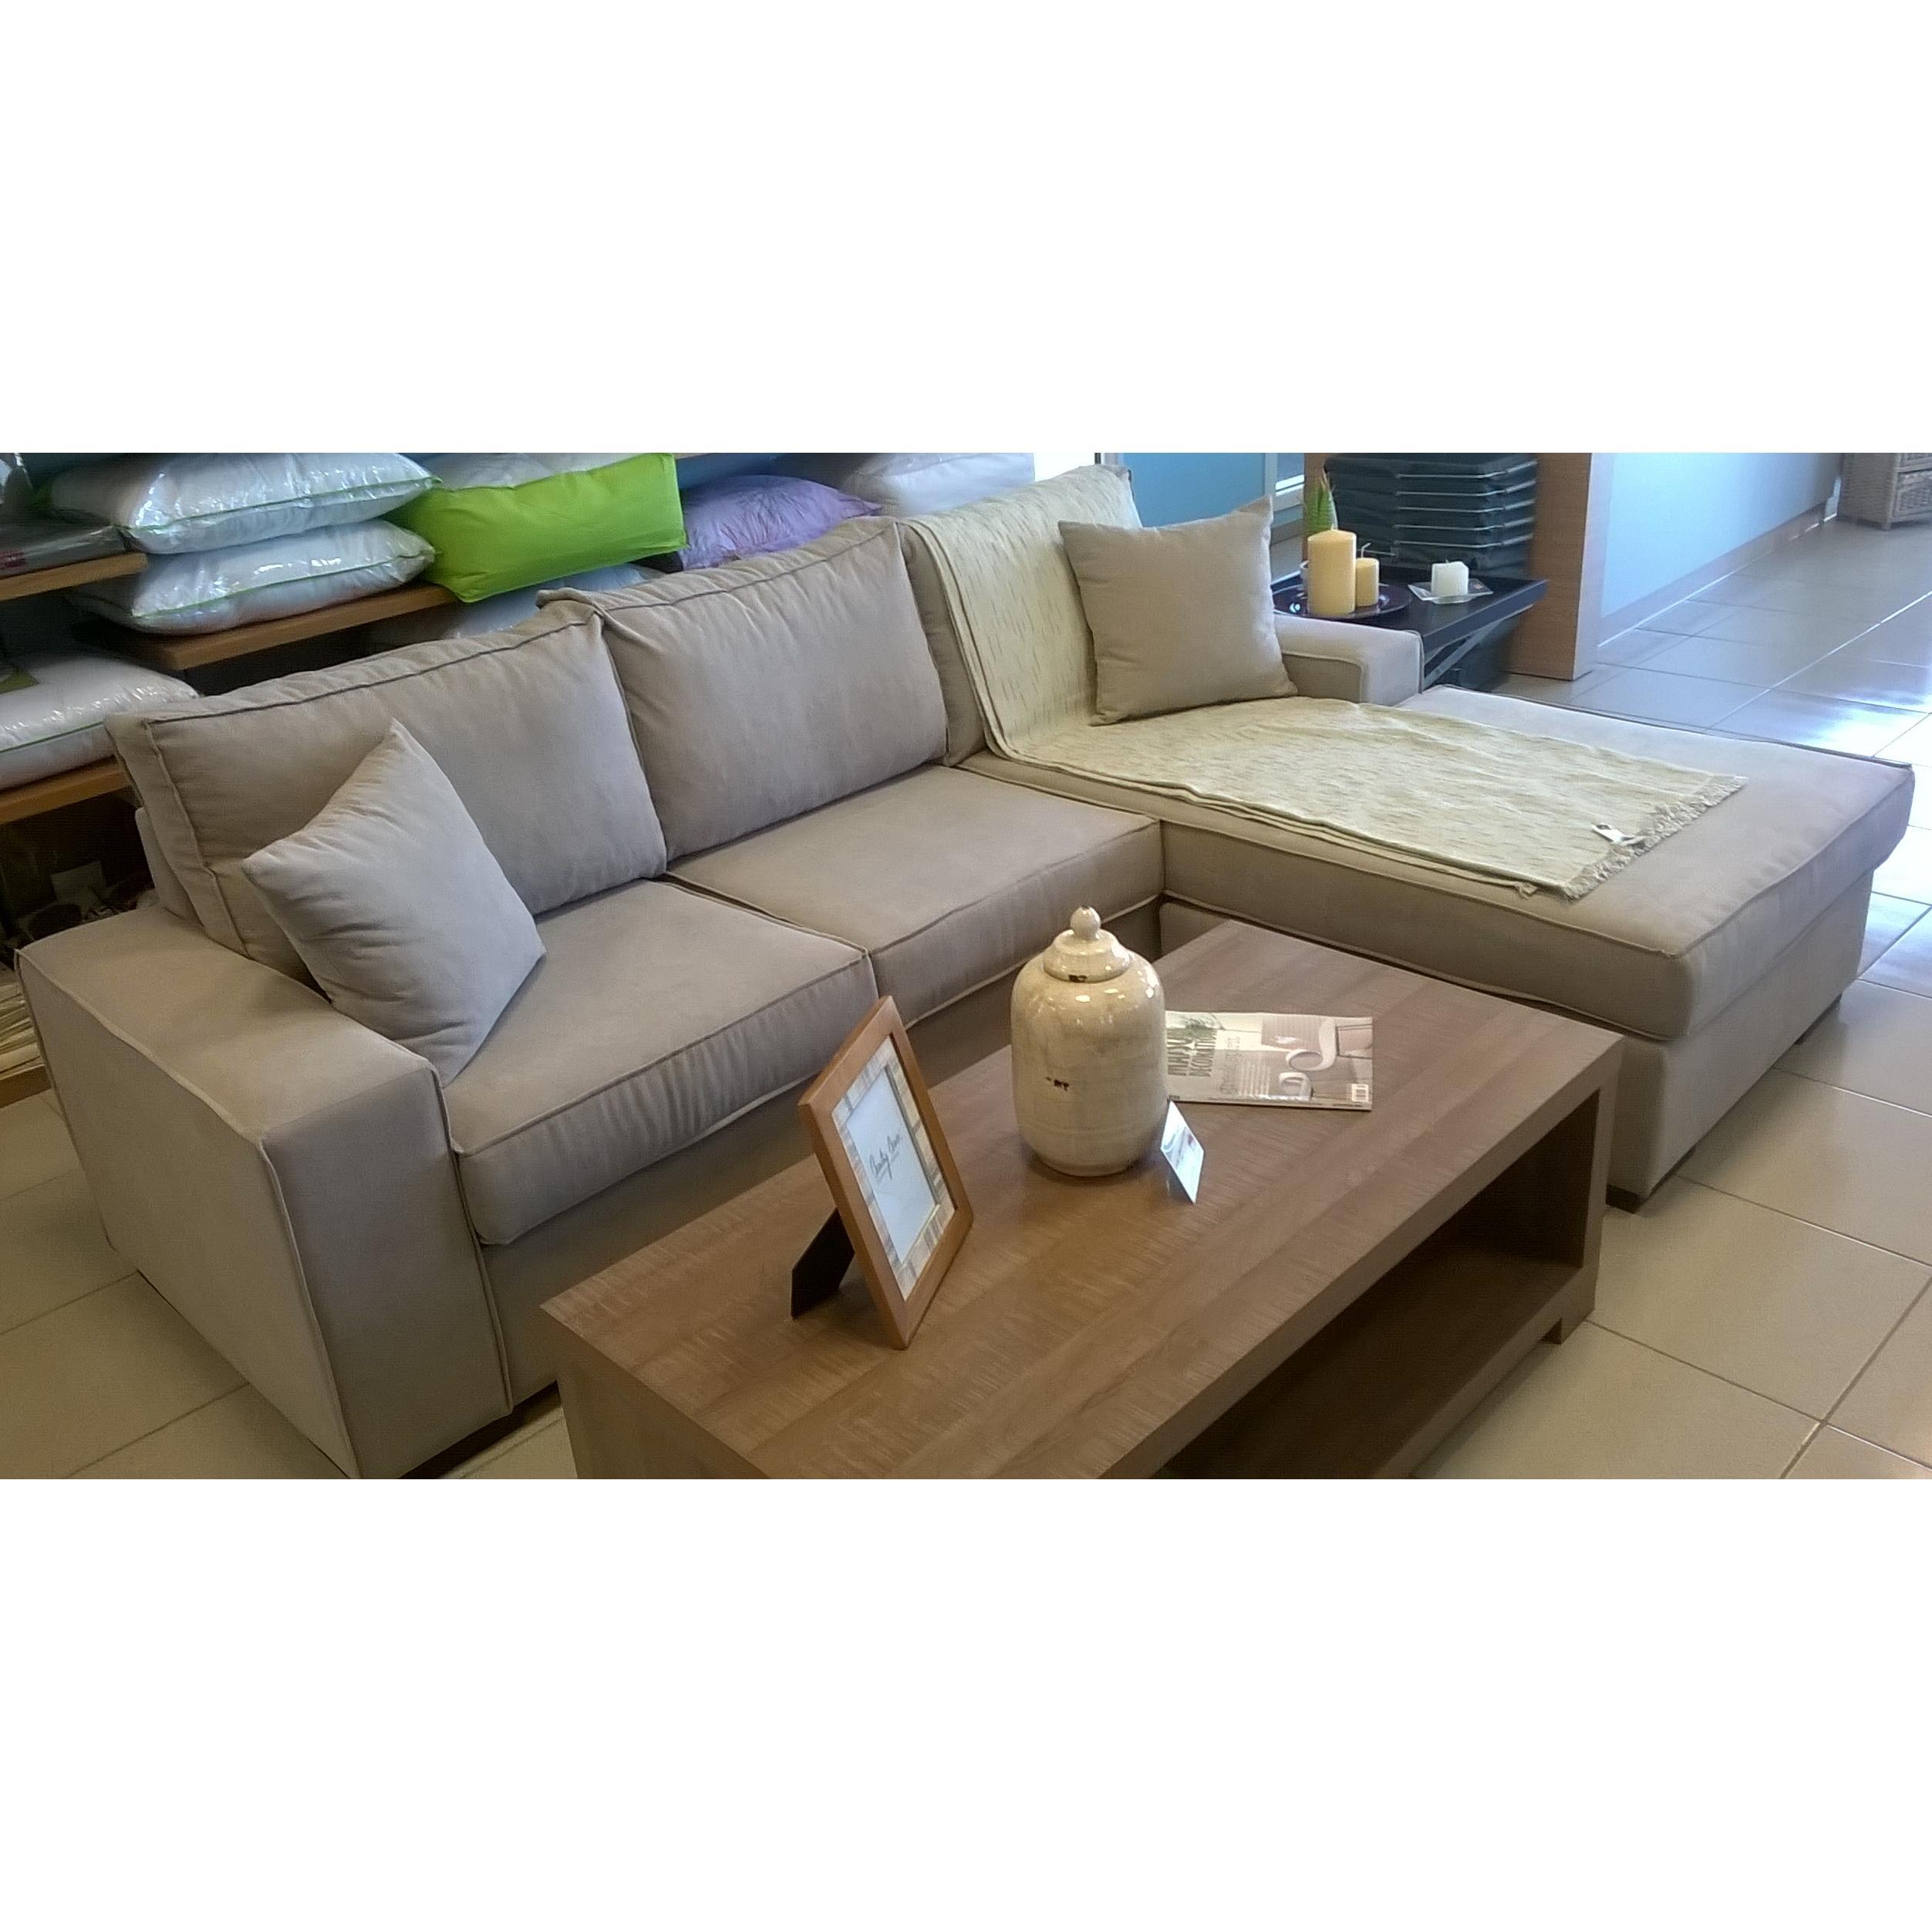 reversible corner sofa sierra 240x170 cm rh homeshops gr reversible corner sofa beds aberdeen reversible corner sofa deals